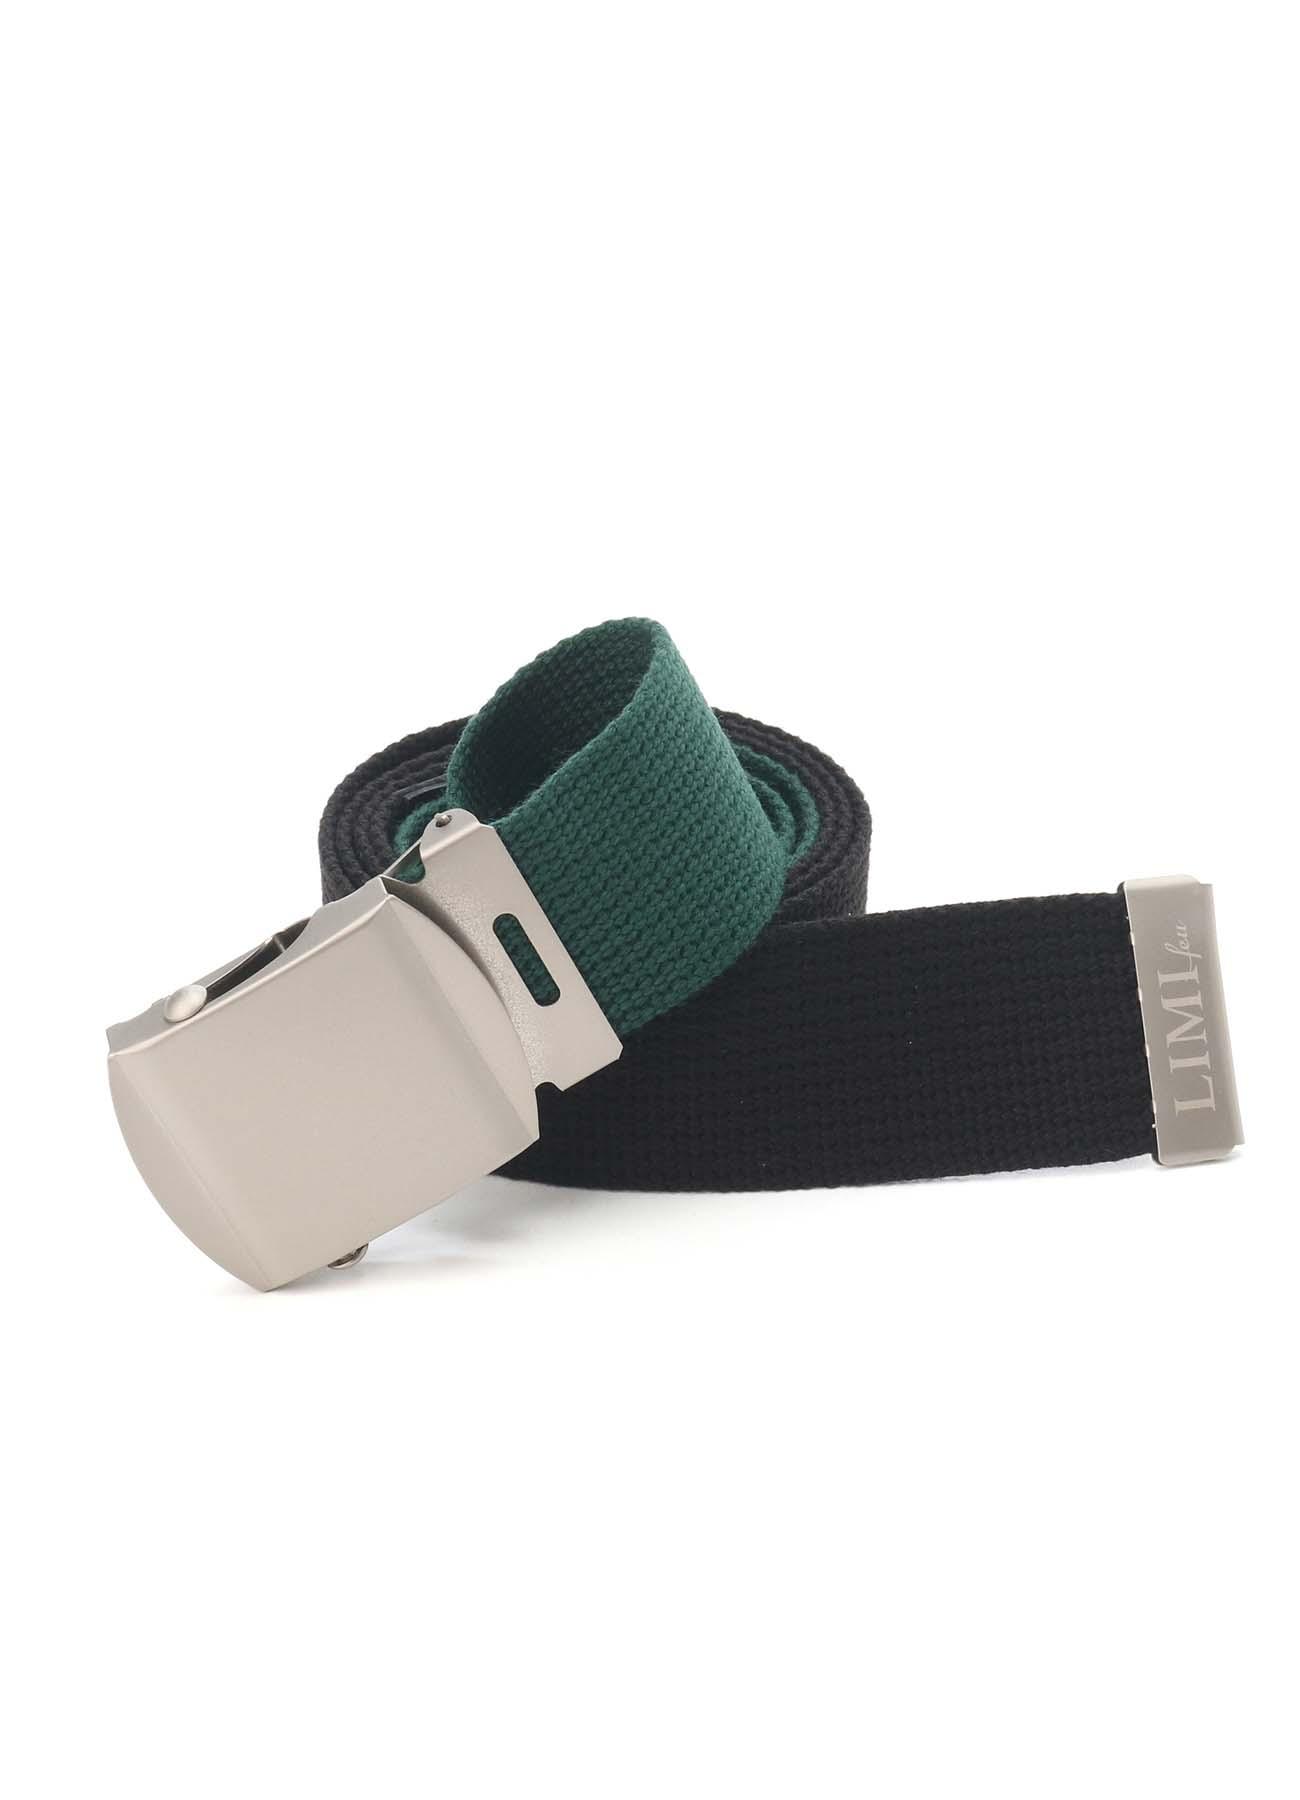 Acrylic Tape GI Belt